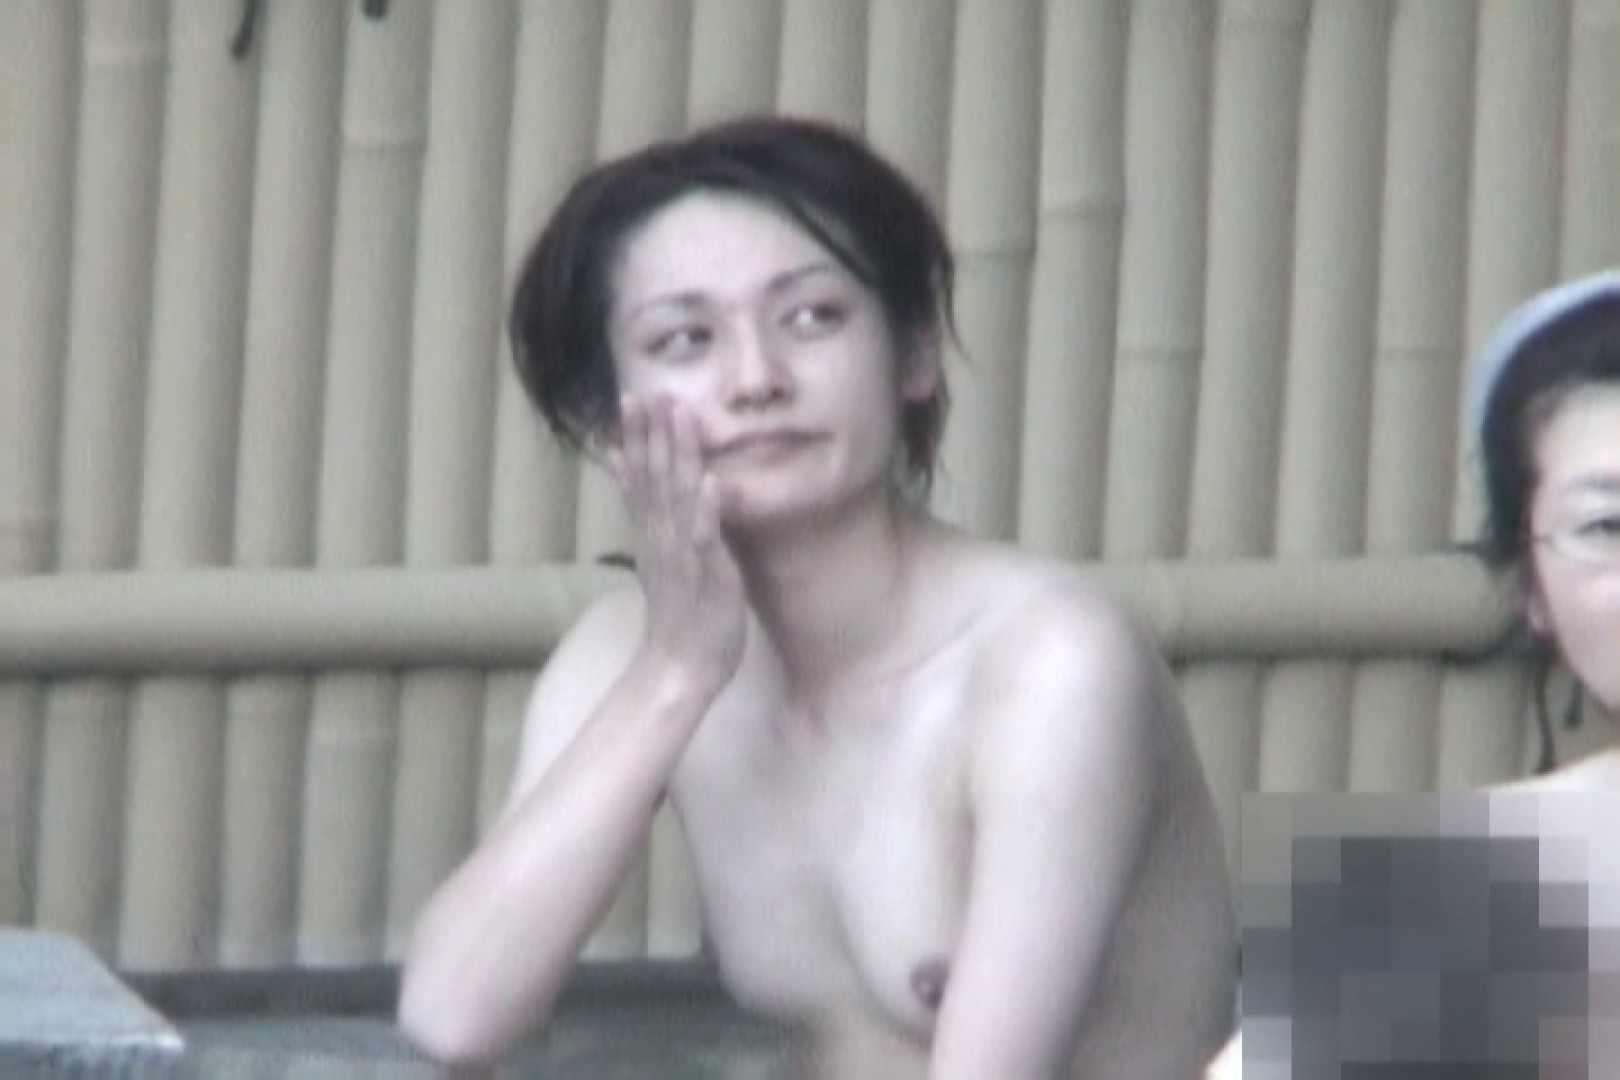 Aquaな露天風呂Vol.839 盗撮シリーズ | 露天風呂編  93PIX 81